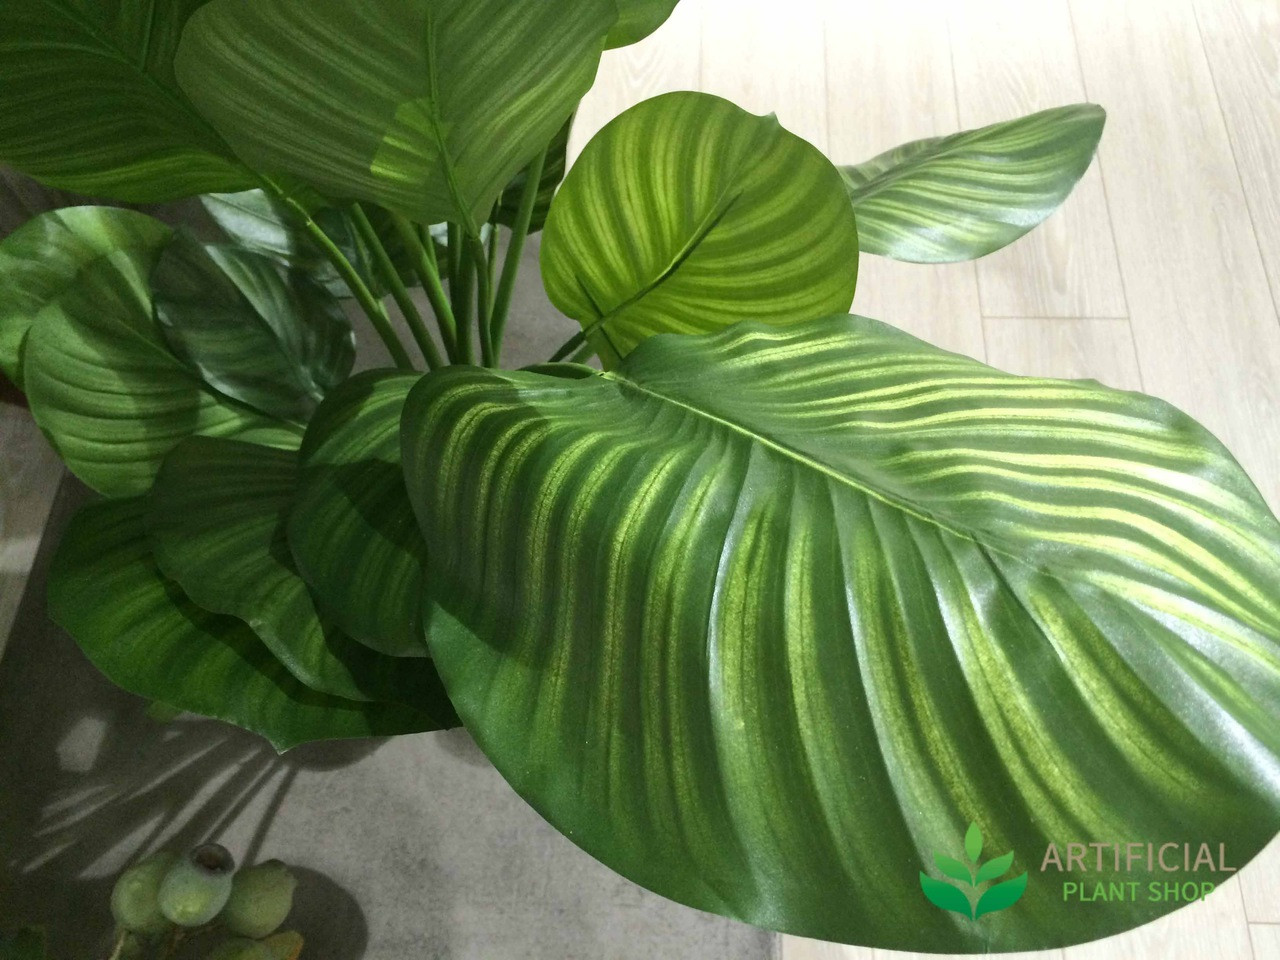 Artificial Calathea Leaves